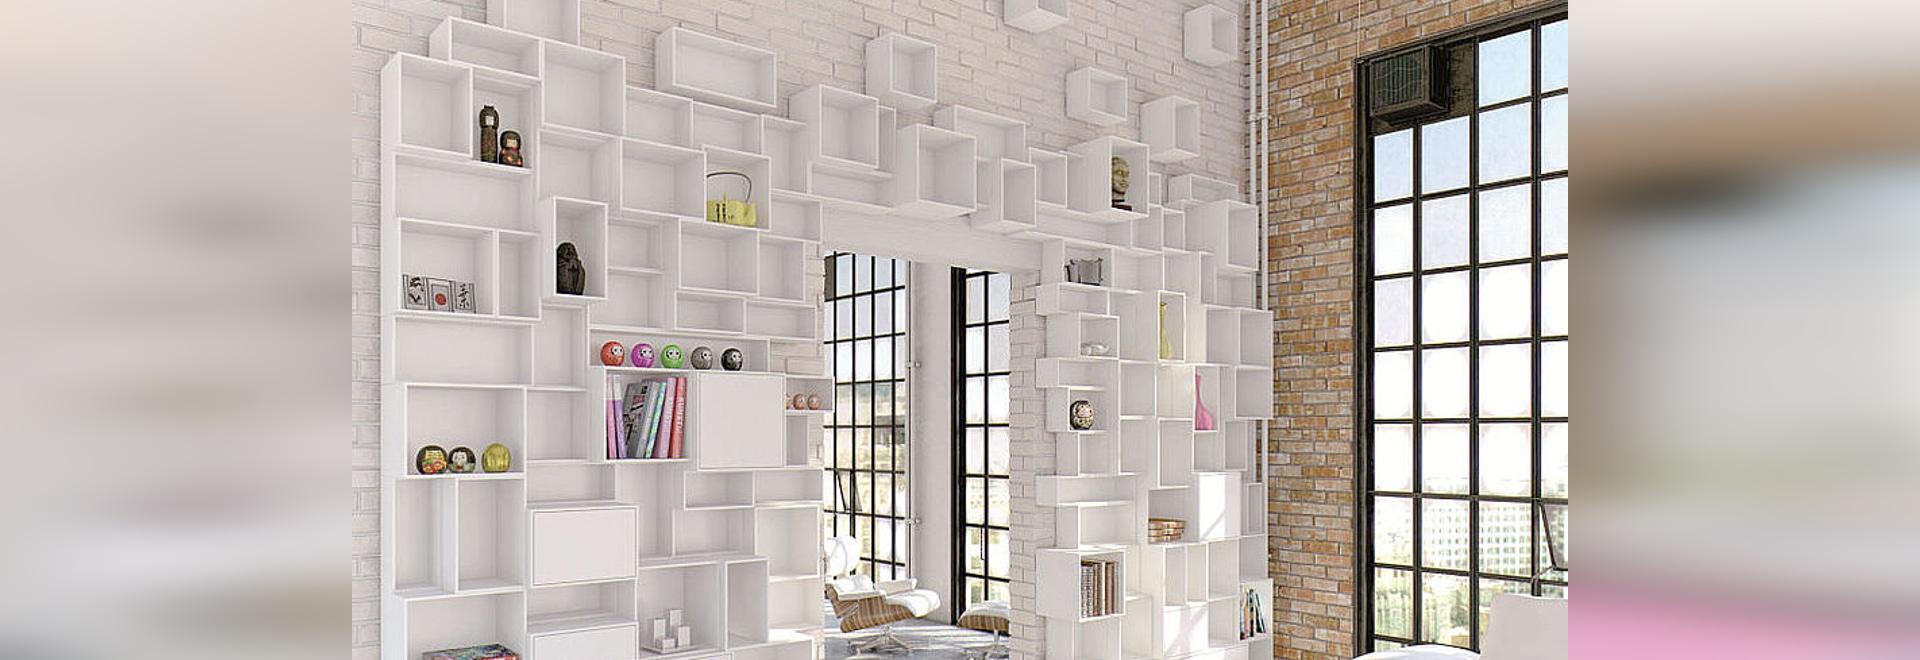 CUBIT-wall-unit